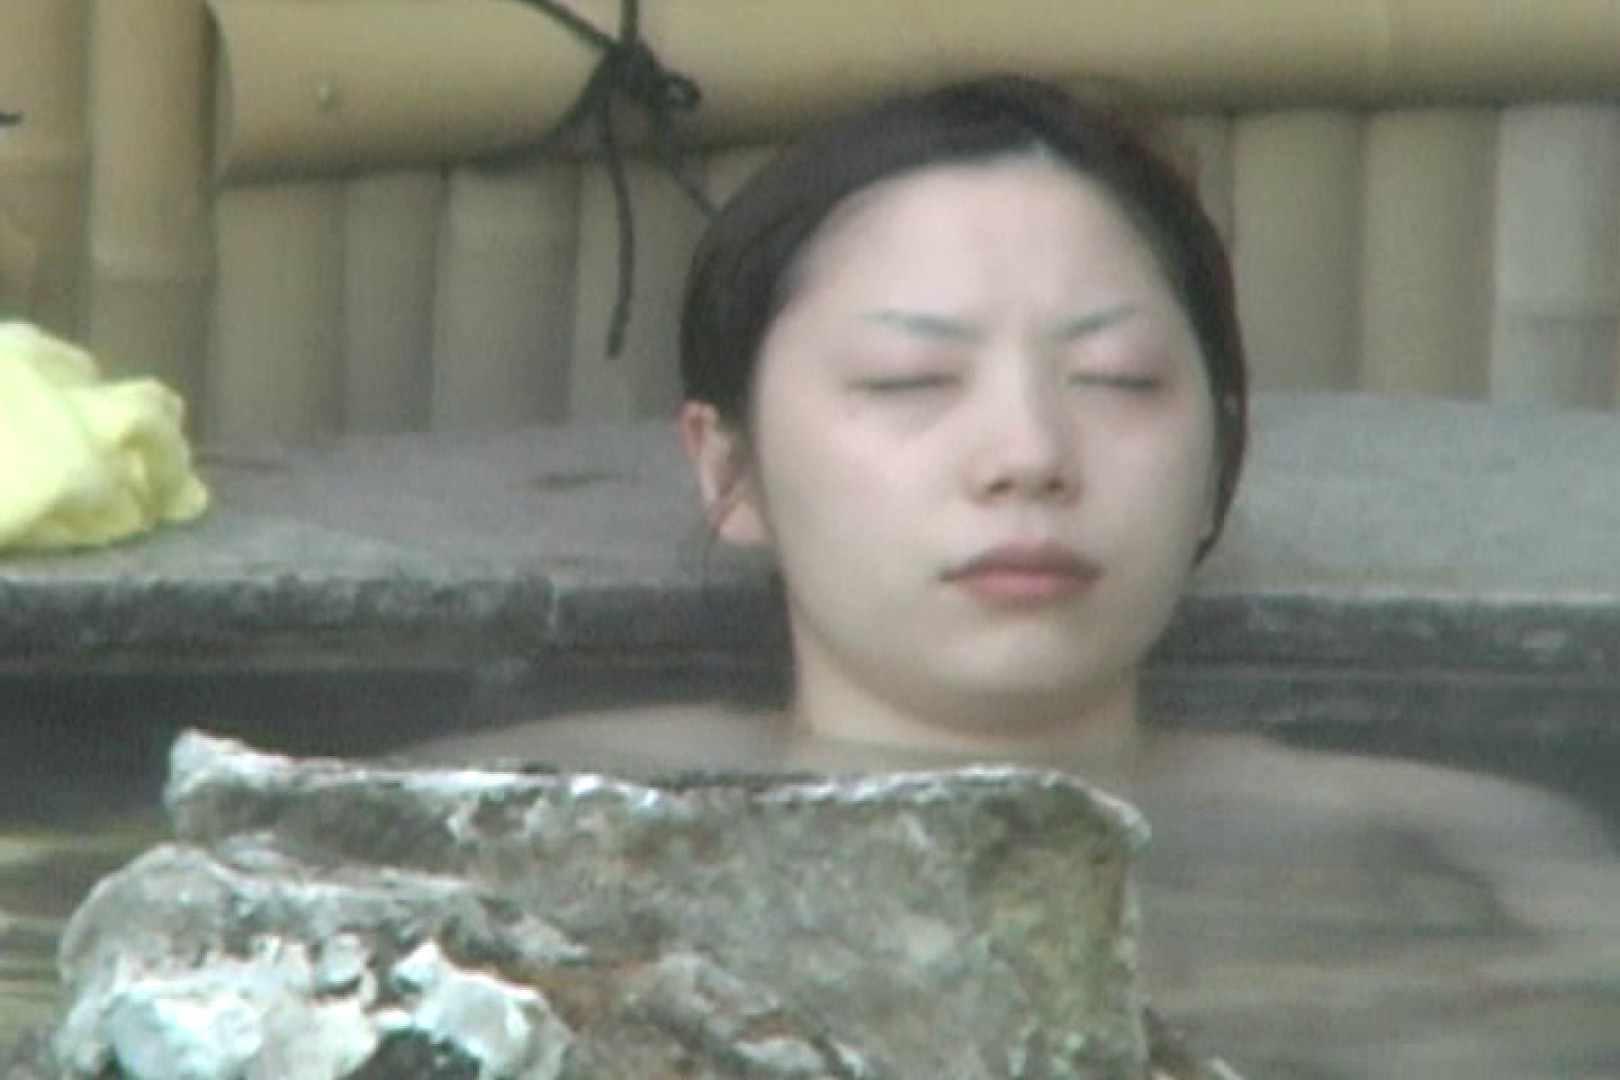 Aquaな露天風呂Vol.596 盗撮シリーズ | 露天風呂編  113PIX 69